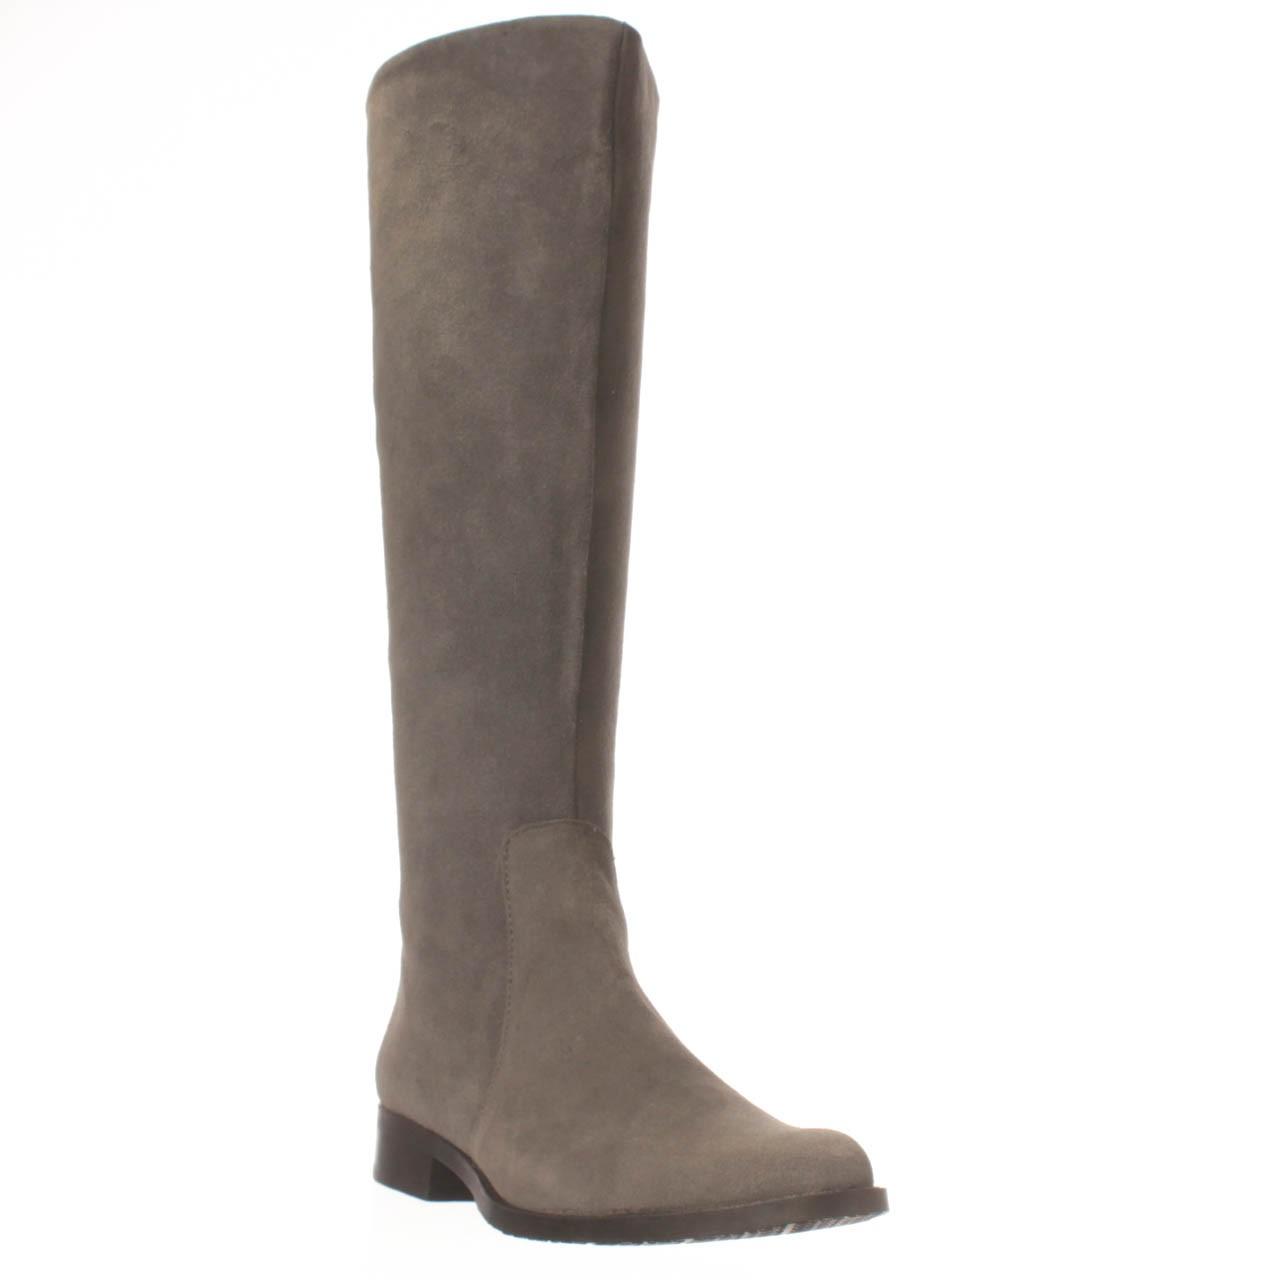 calvin klein taylie knee high boot in gray lyst